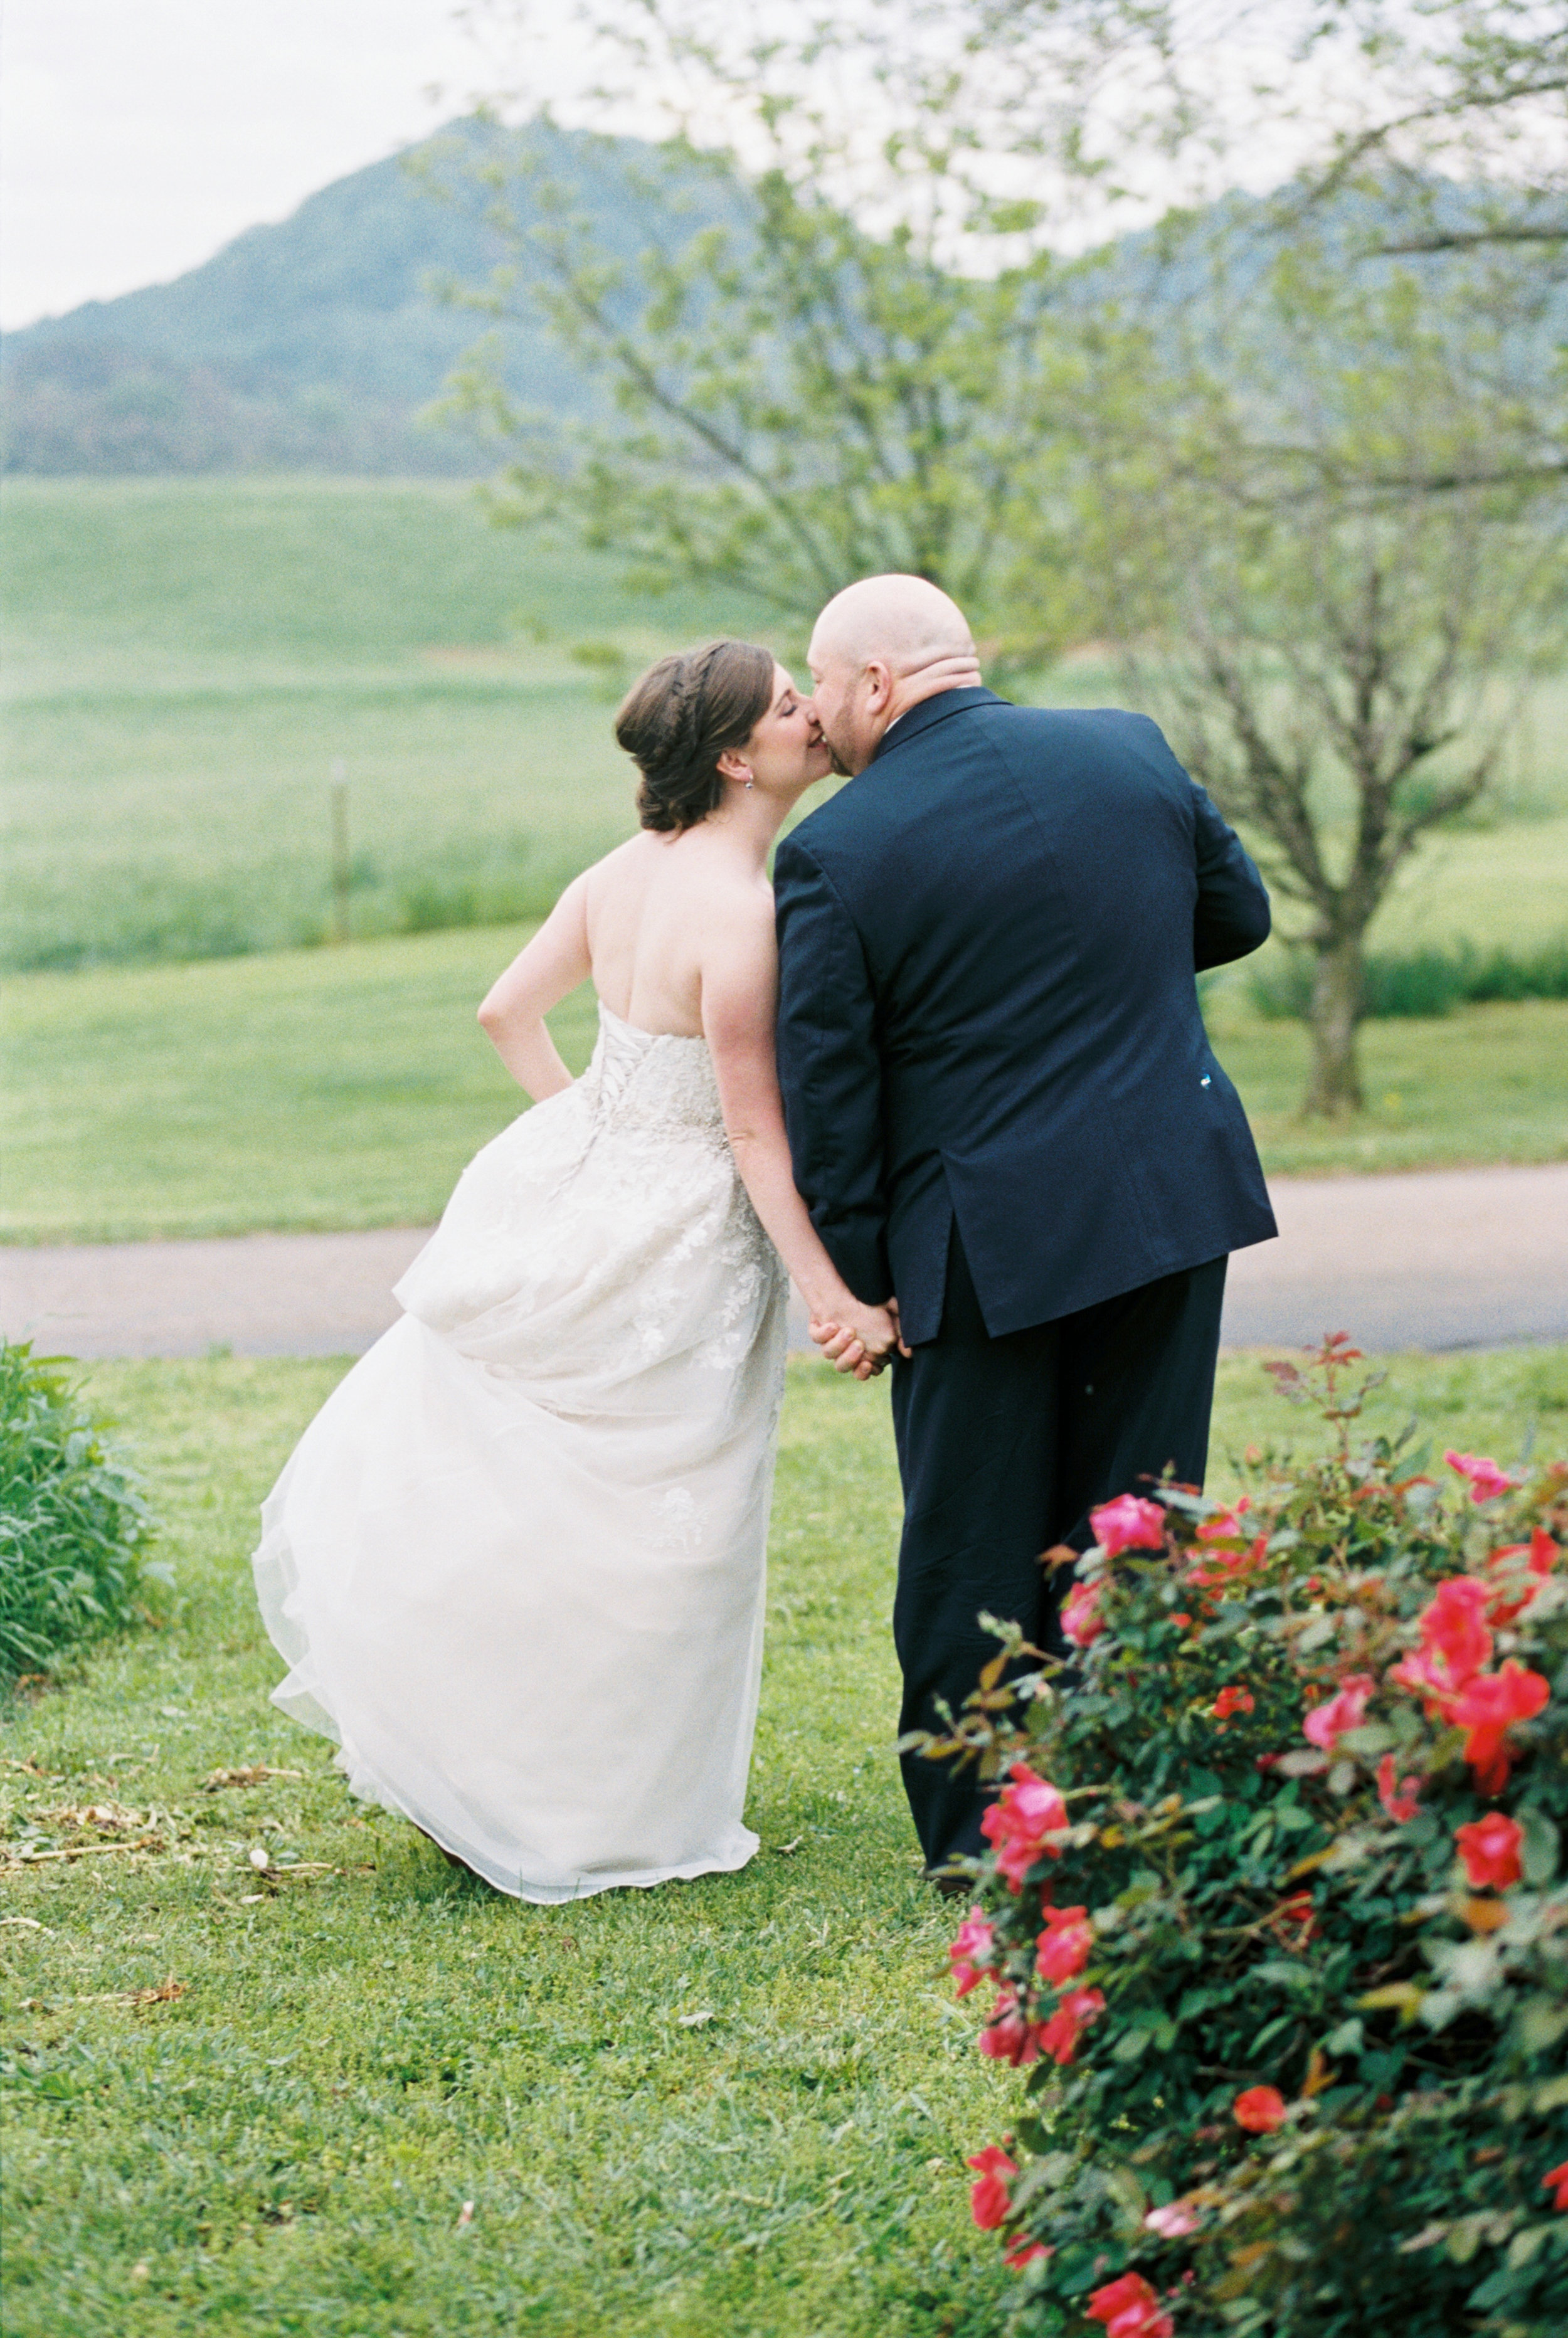 Lydia_johnathan_Wedding_Abigail_Malone_Photography-215.jpg